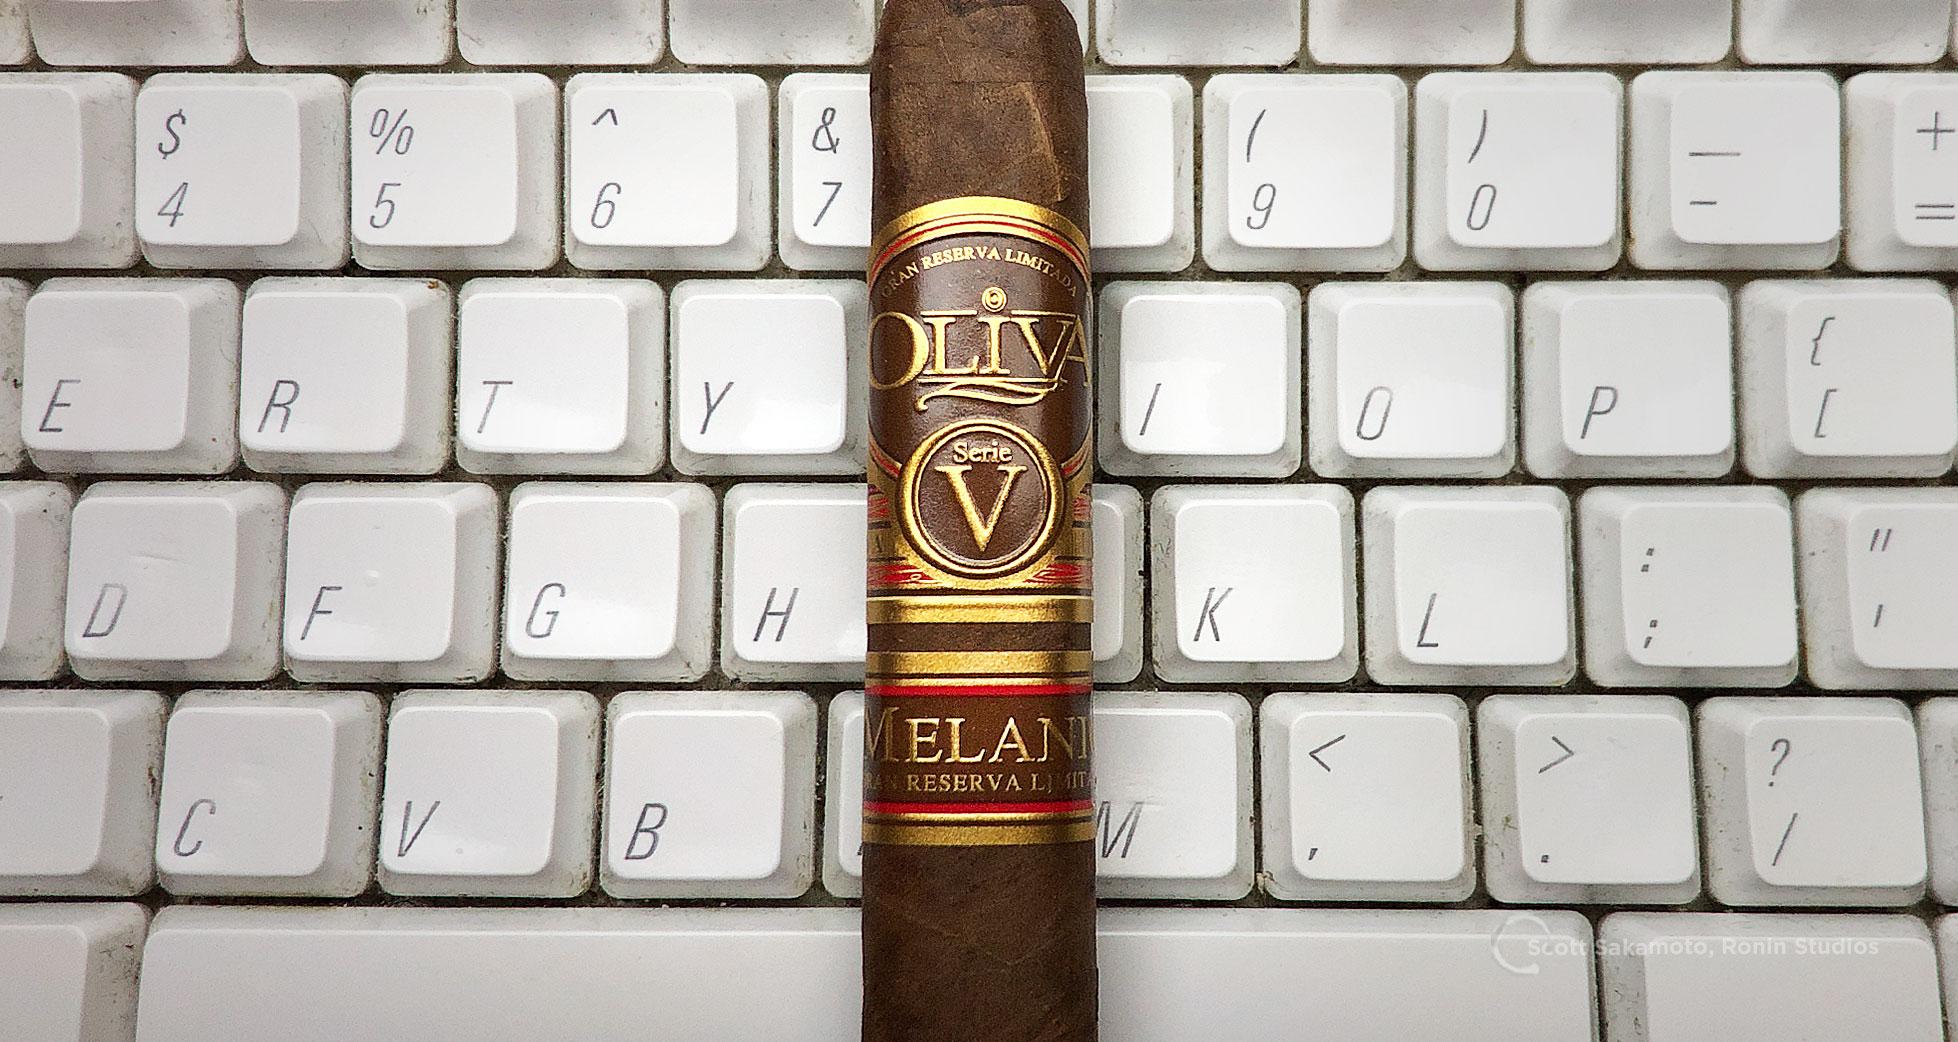 Ecuadorian: Sumatra, Melanio, Nicaraguan, Oliva, Oliva Cigar, Robusto, Serie V